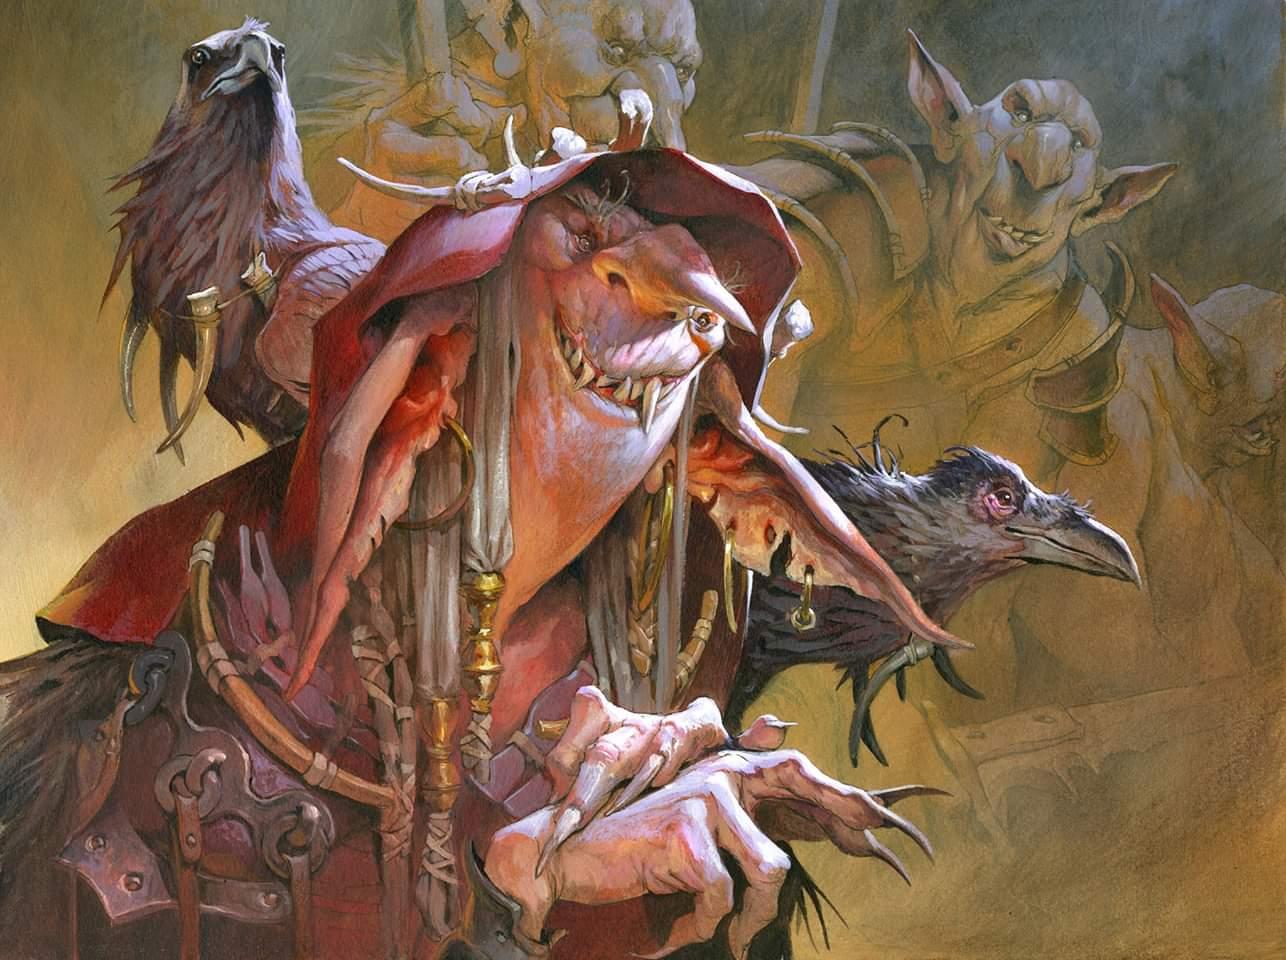 Goblin Matron | Illustration by Jesper Ejsing